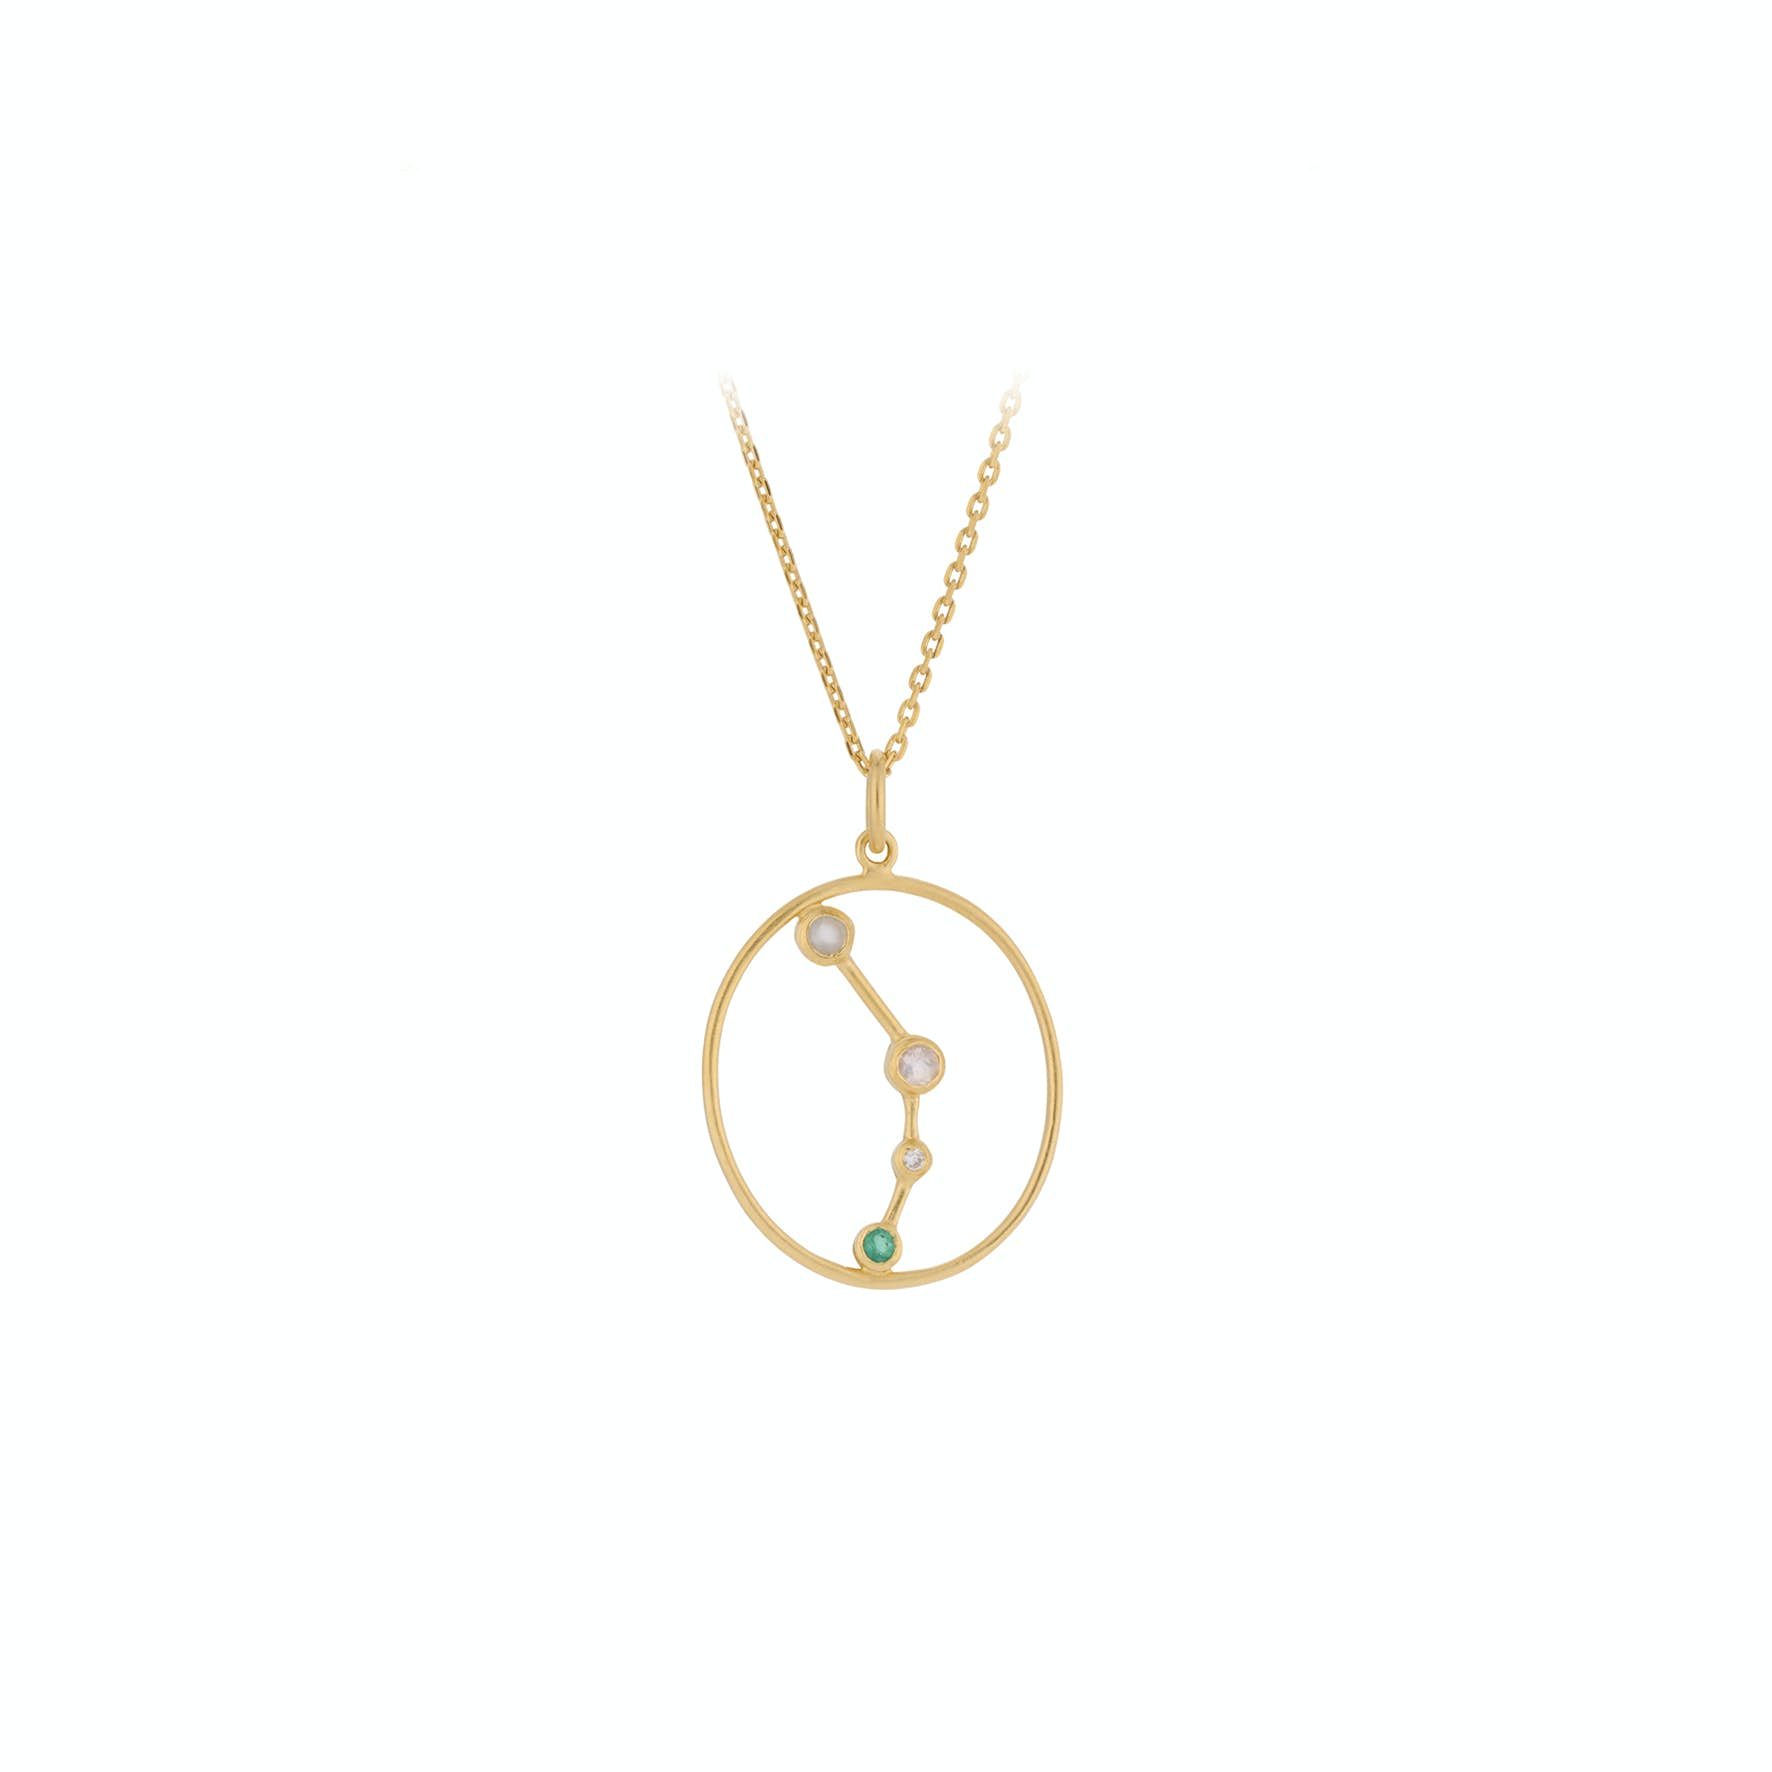 Zodiac Aries Necklace (Mar 21 - Apr 19) von Pernille Corydon in Vergoldet-Silber Sterling 925